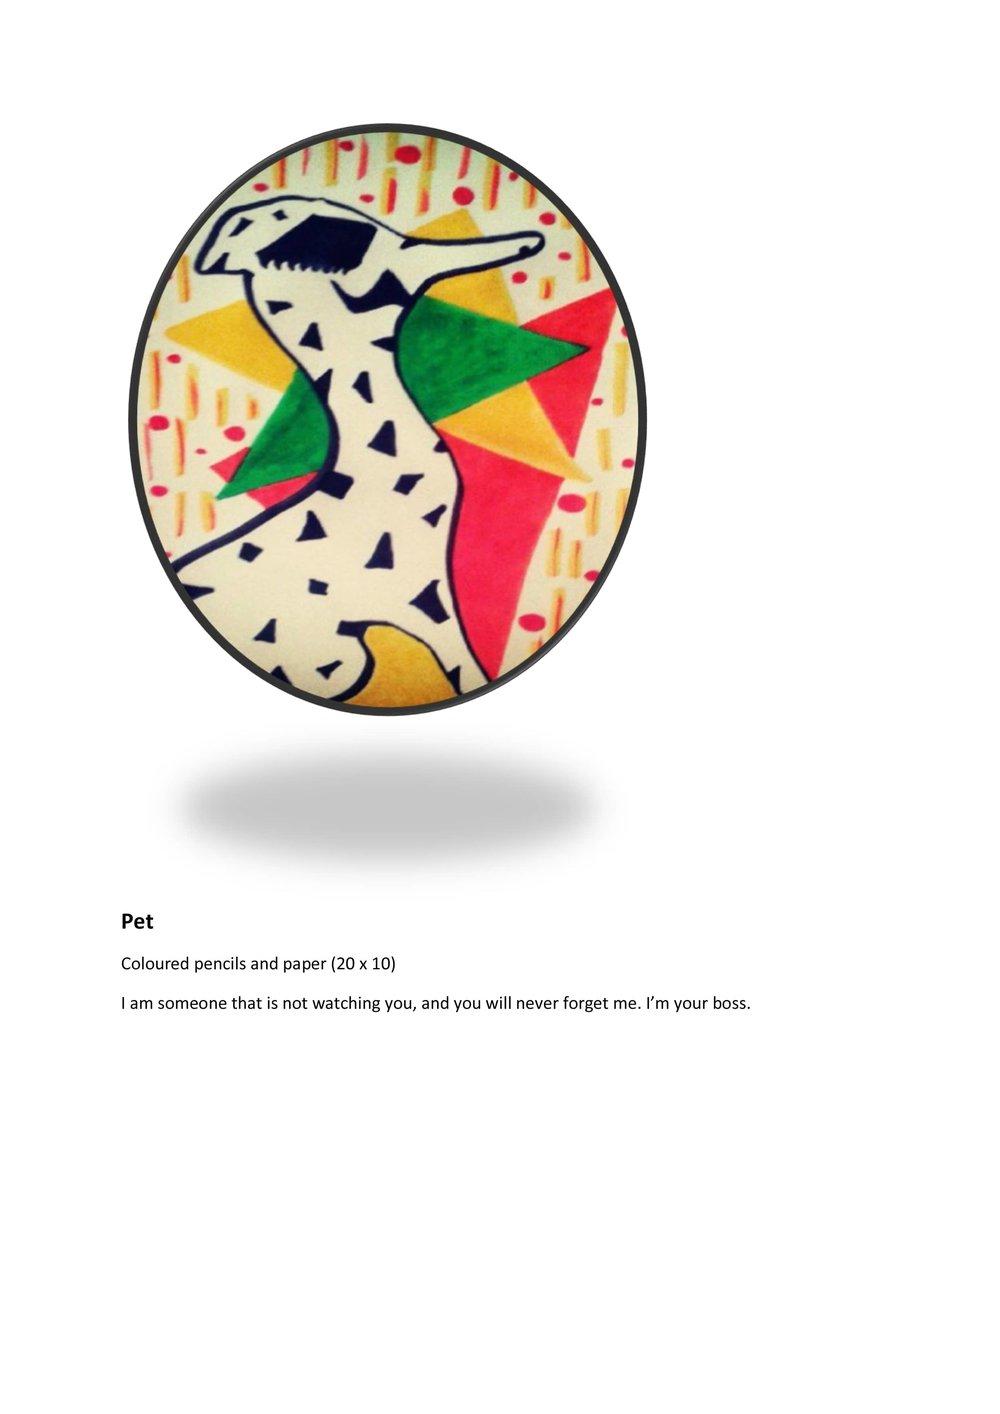 art-portfolio-aglae-corrected-19-min.jpg